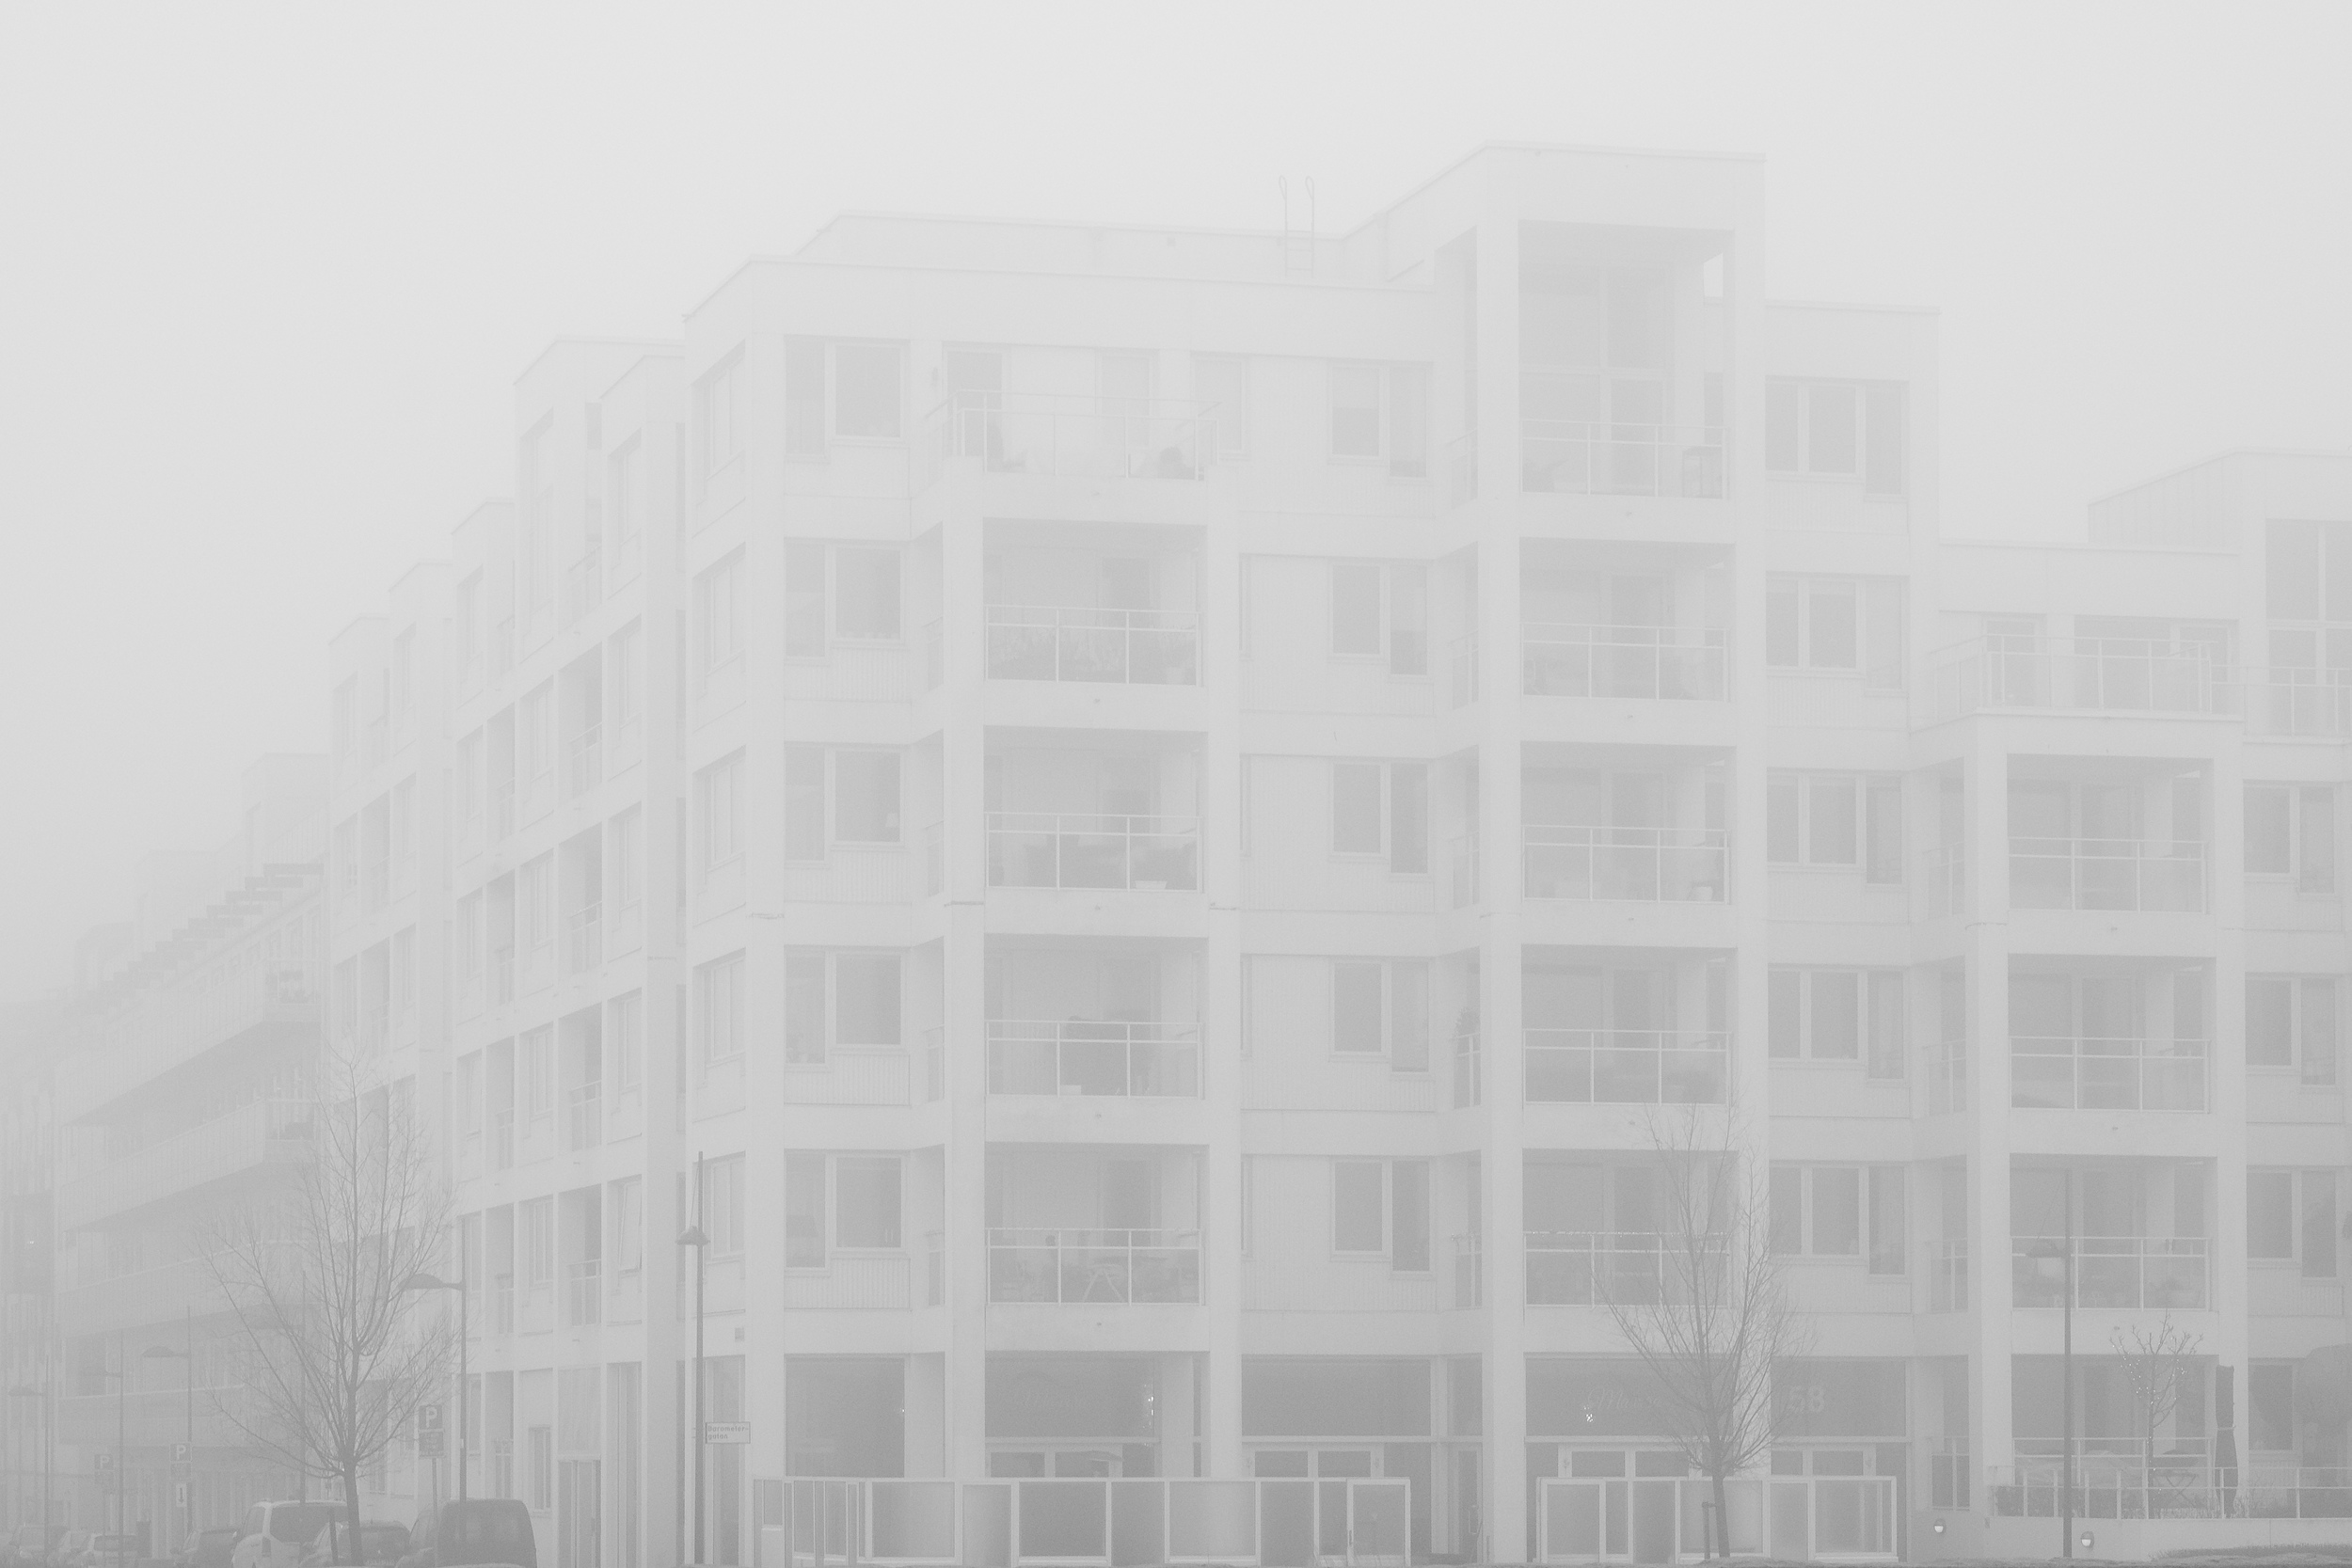 Winterfog-7612.jpg